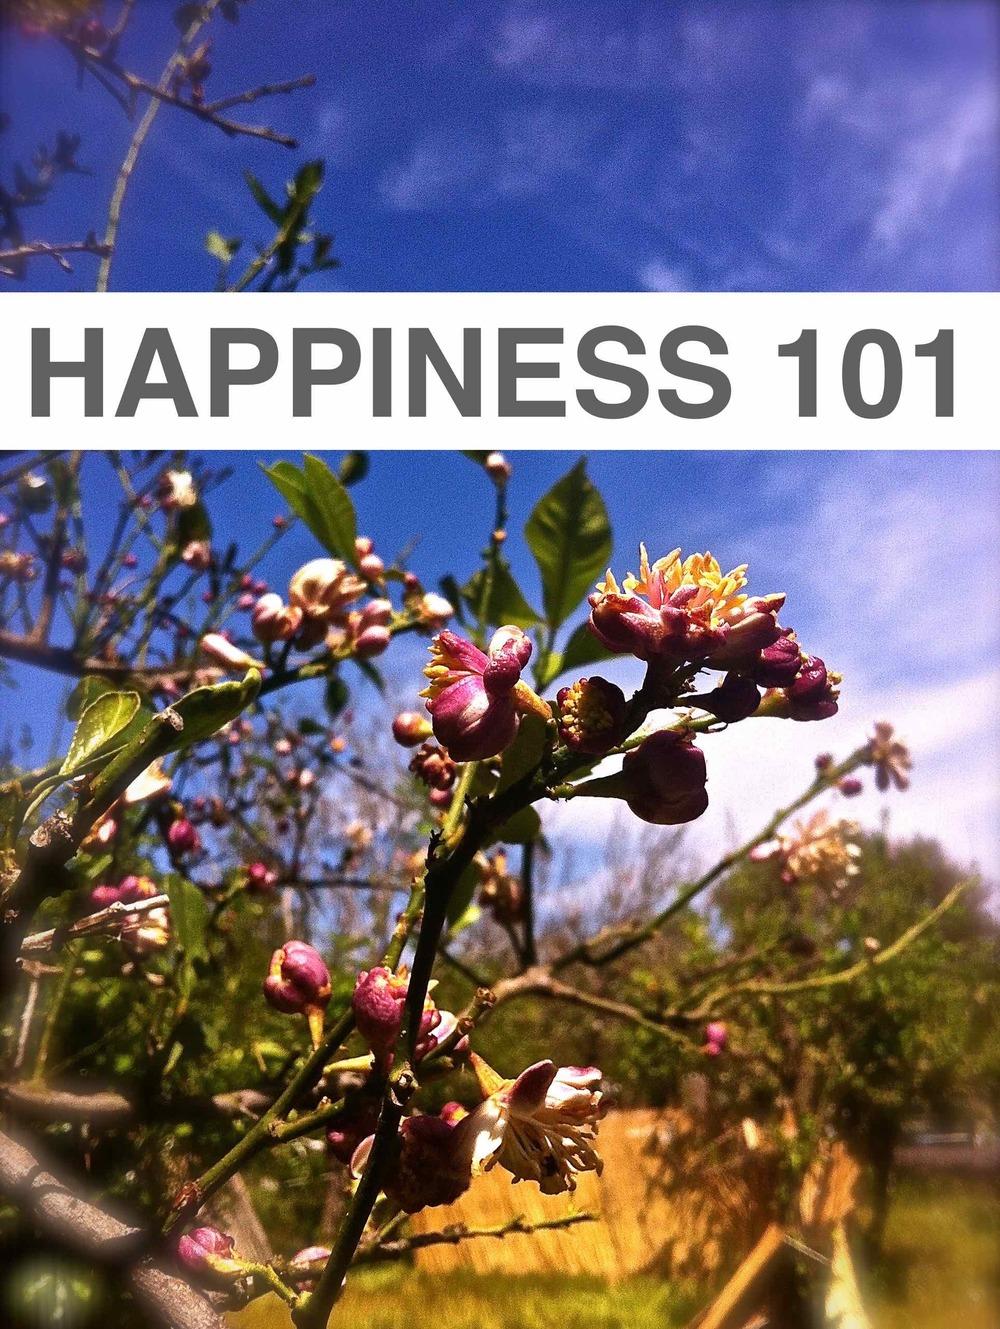 Happiness 101 image.jpg